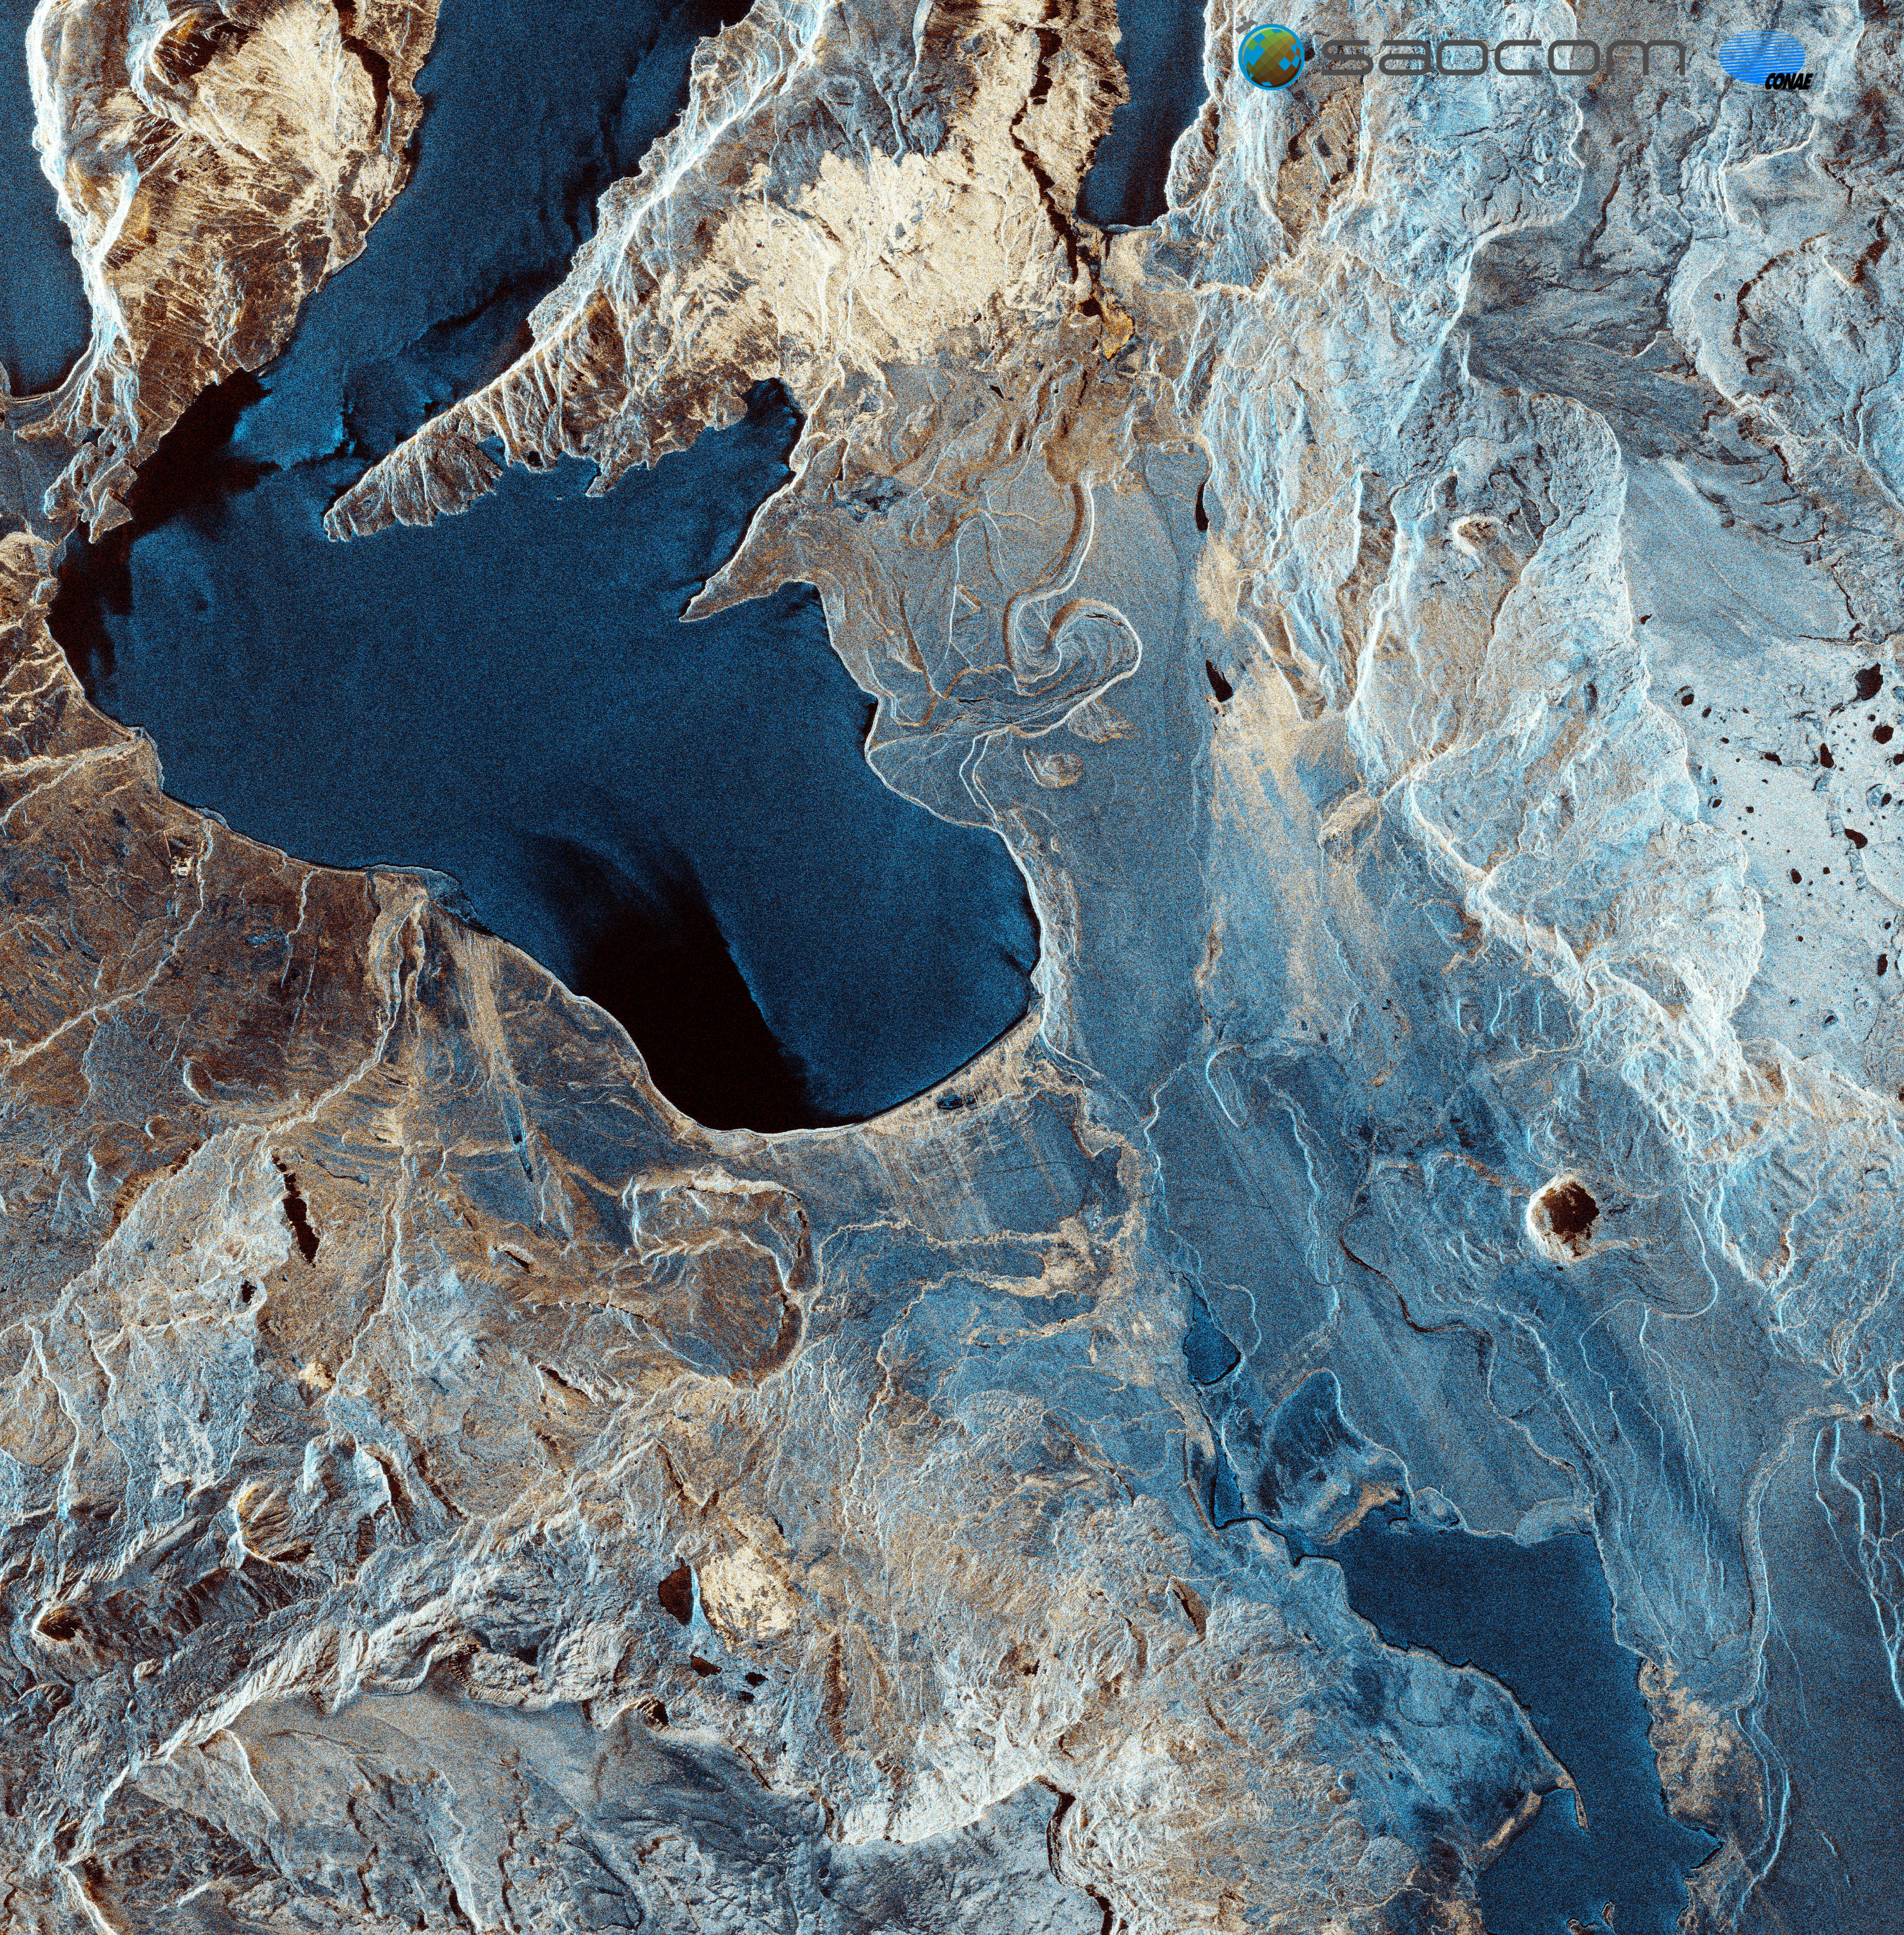 SAOCOM 1A y SAOCOM 1B - Satélites hechos en Argentina - Página 2 3detalle-del-lago-san-martin-3